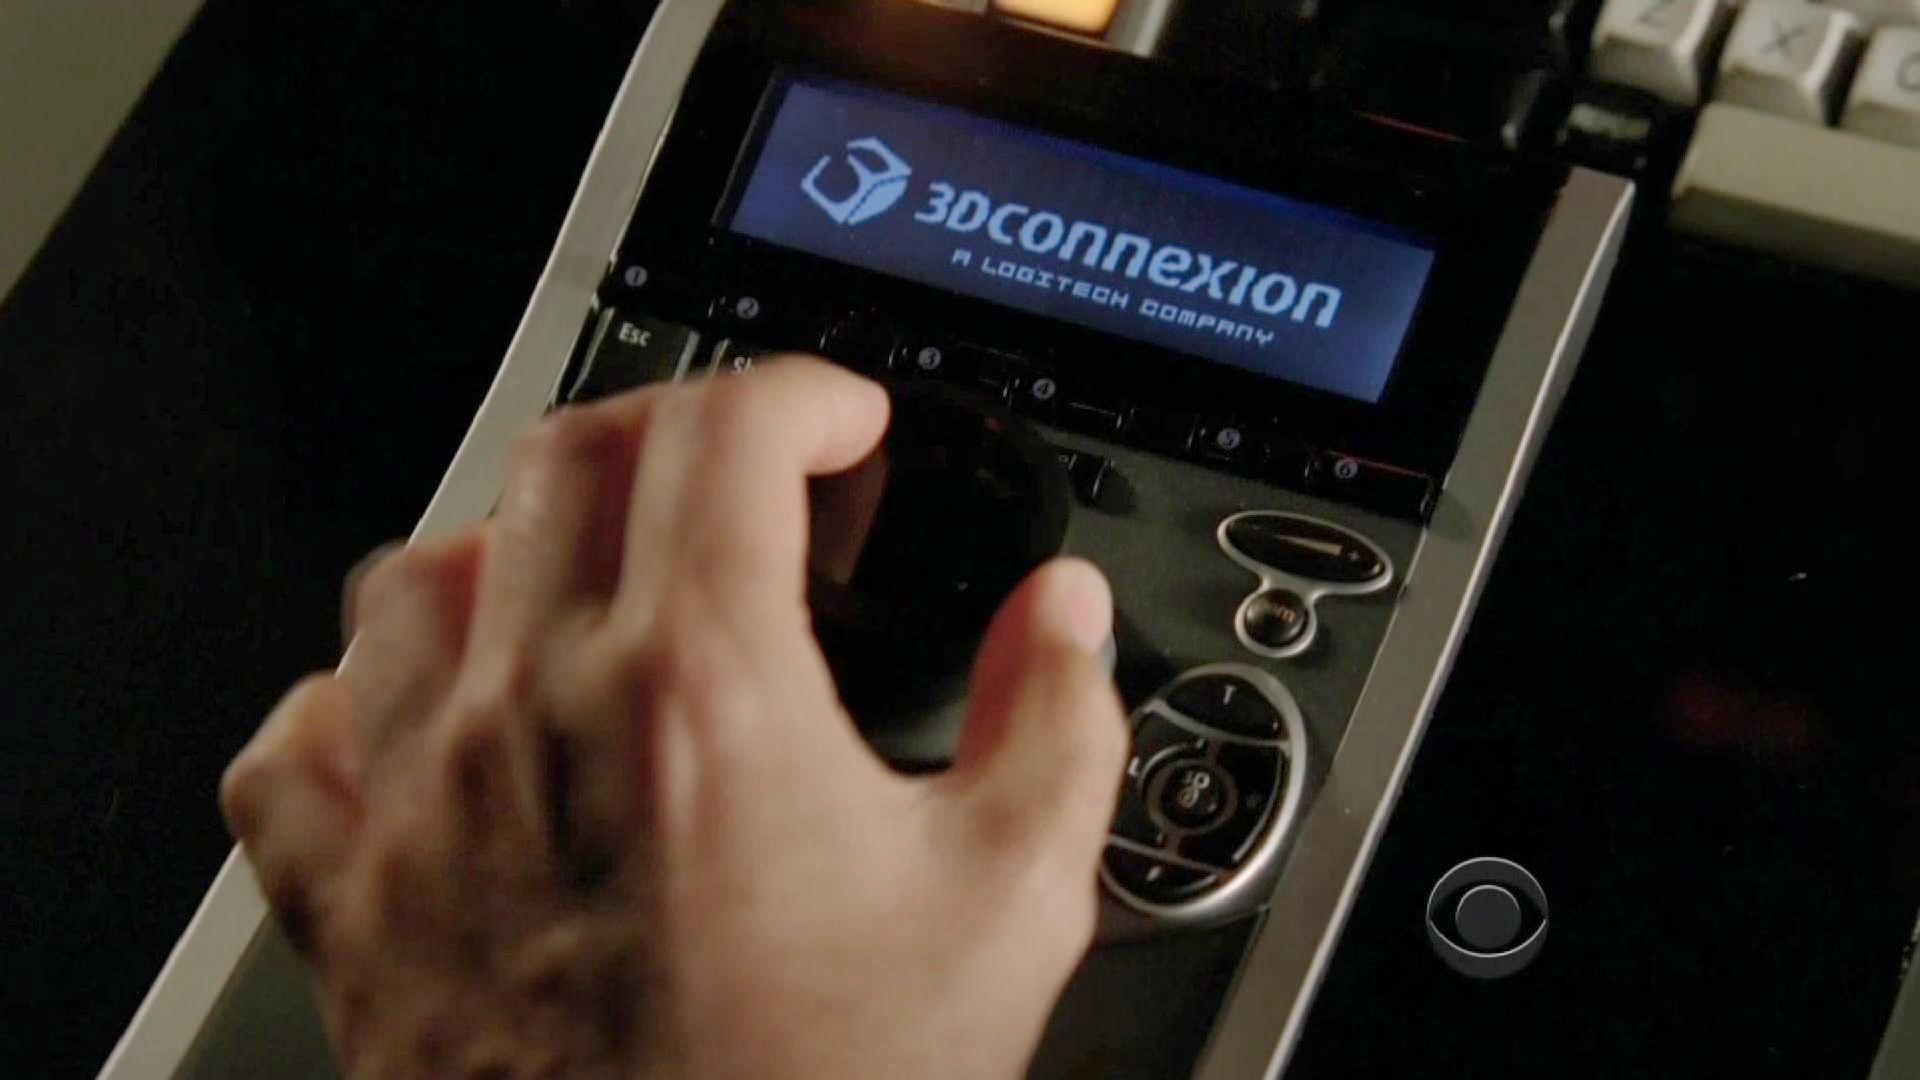 3DConnection • CSI New York